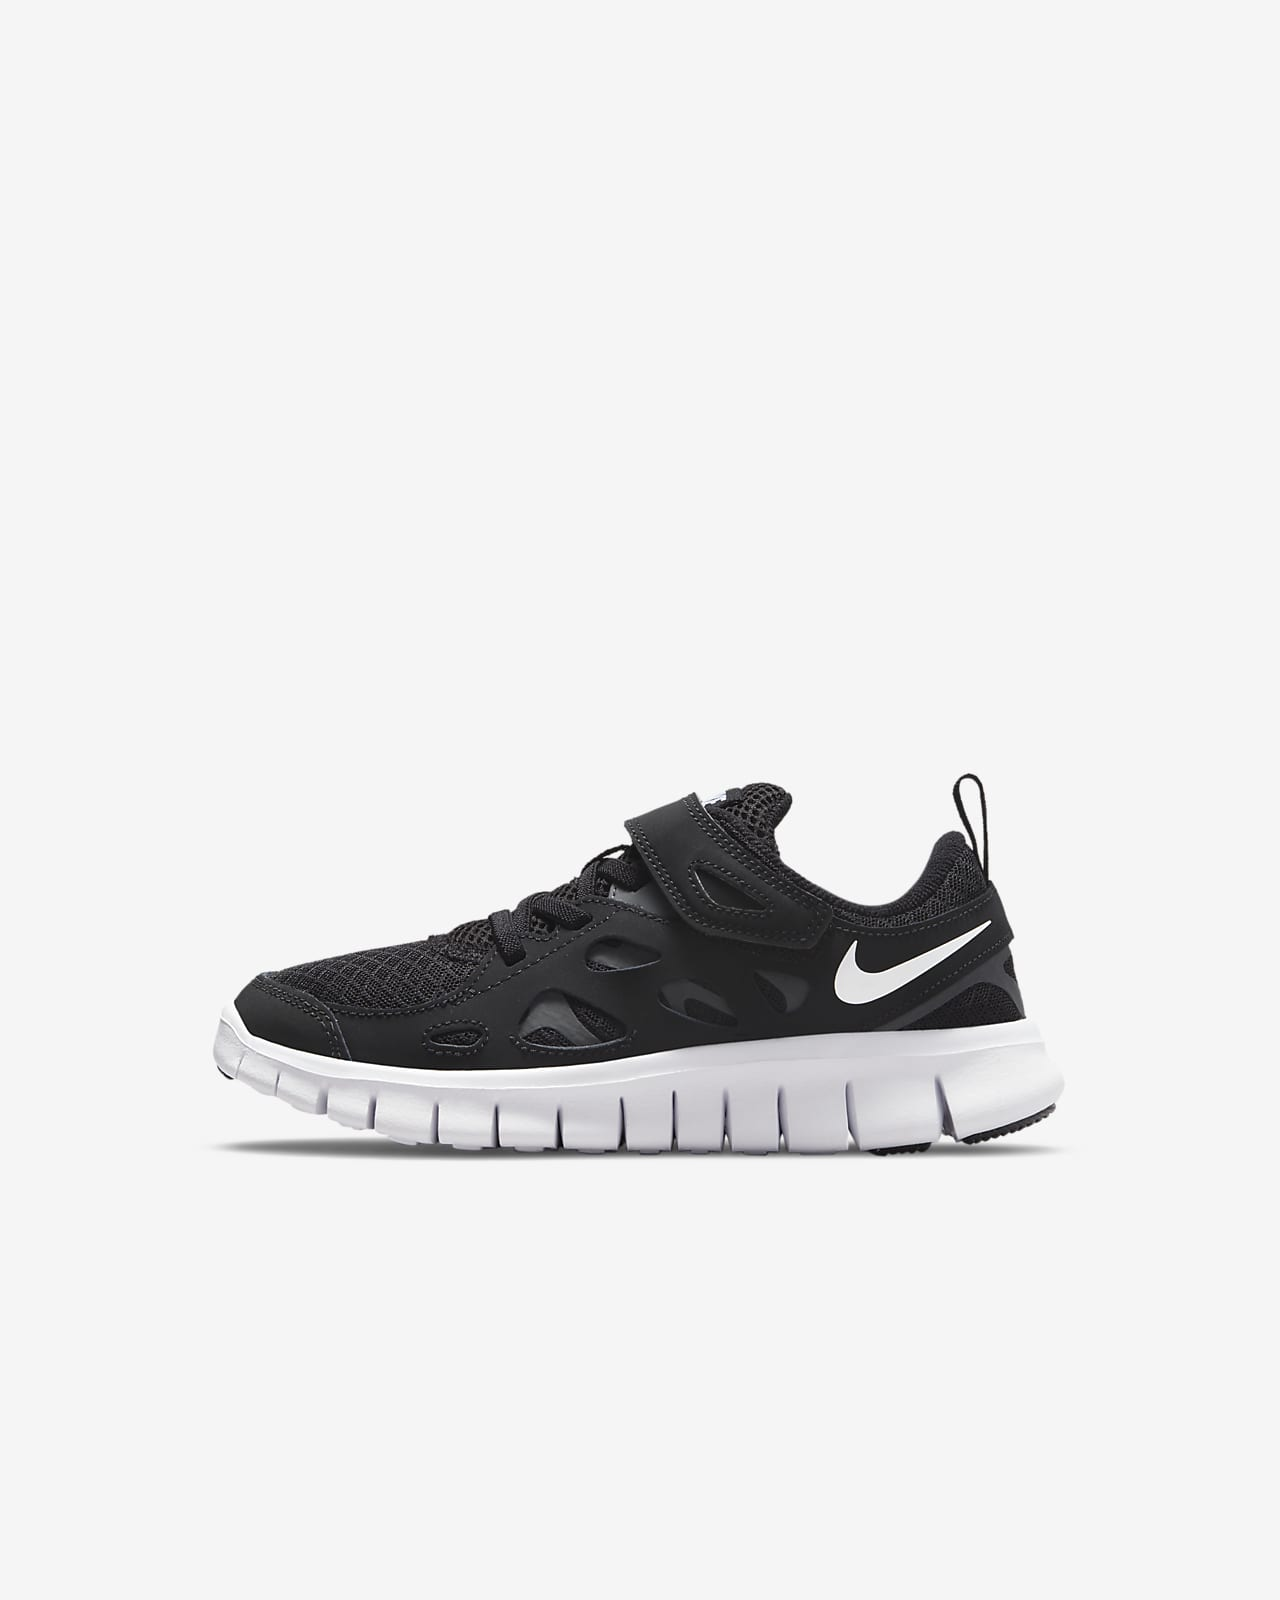 Chaussure Nike Free Run 2 pour Jeune enfant